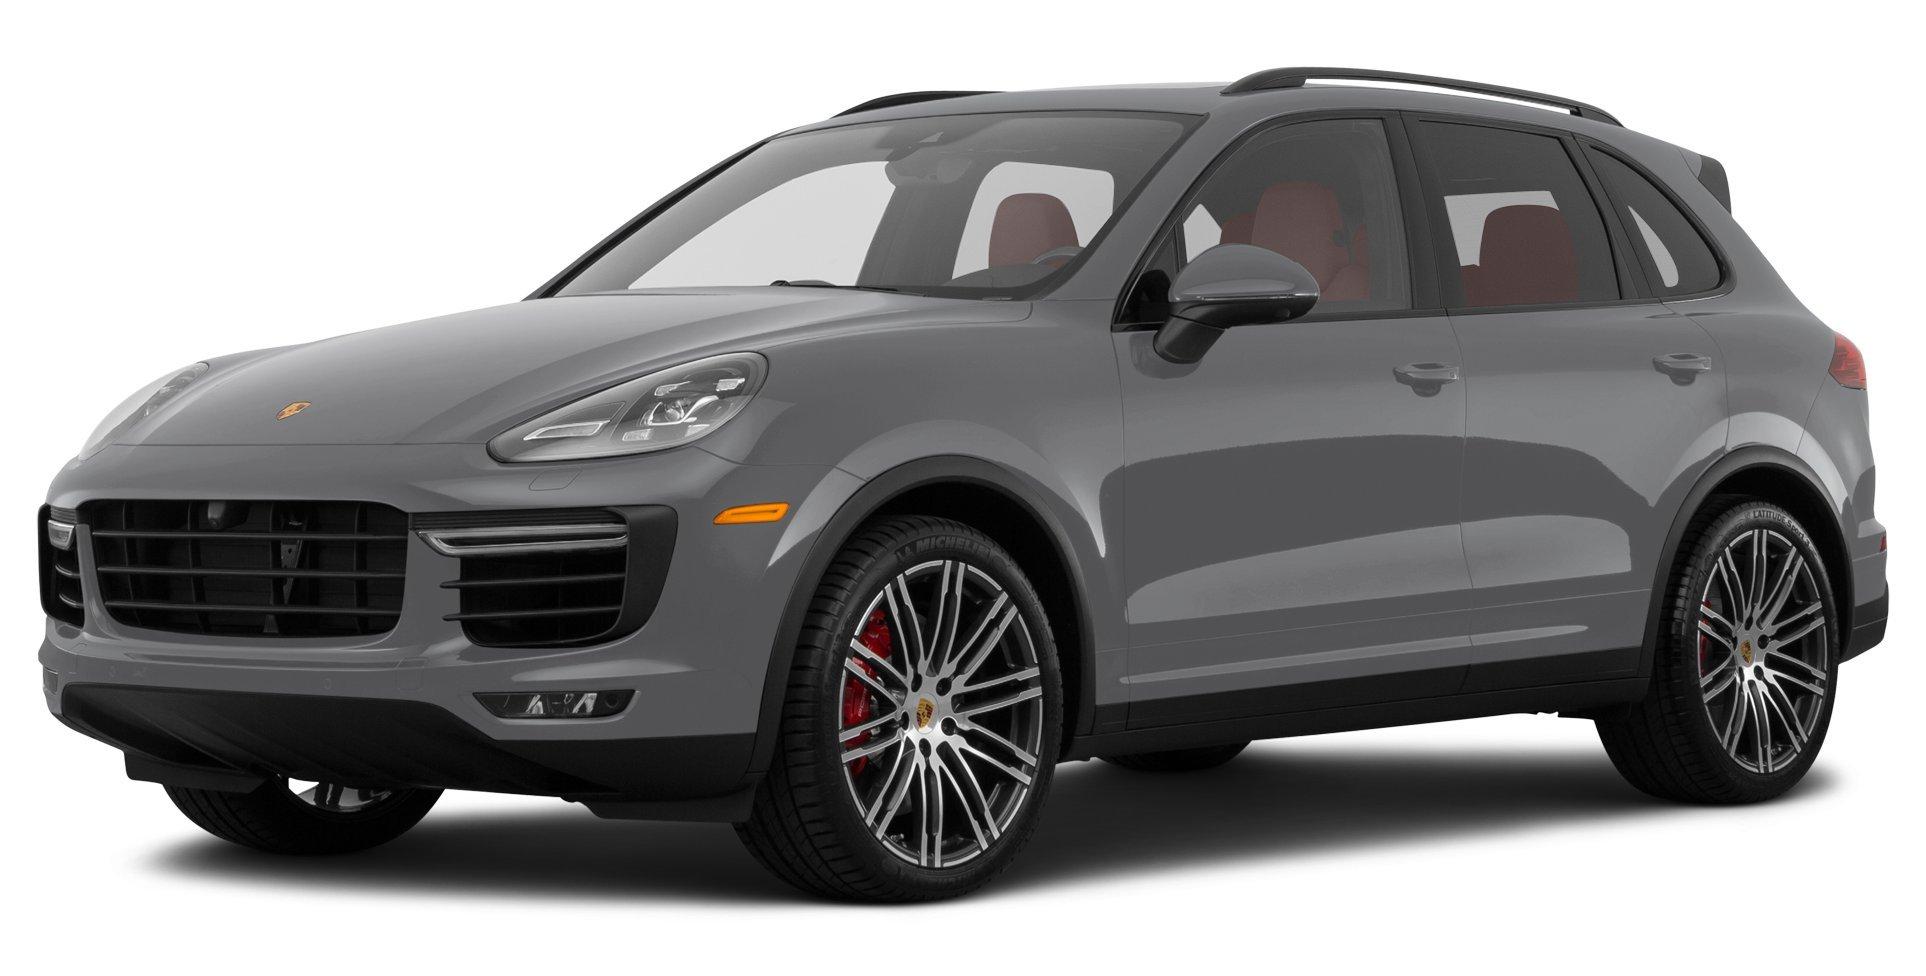 ... 2018 Porsche Cayenne Turbo S, All Wheel Drive